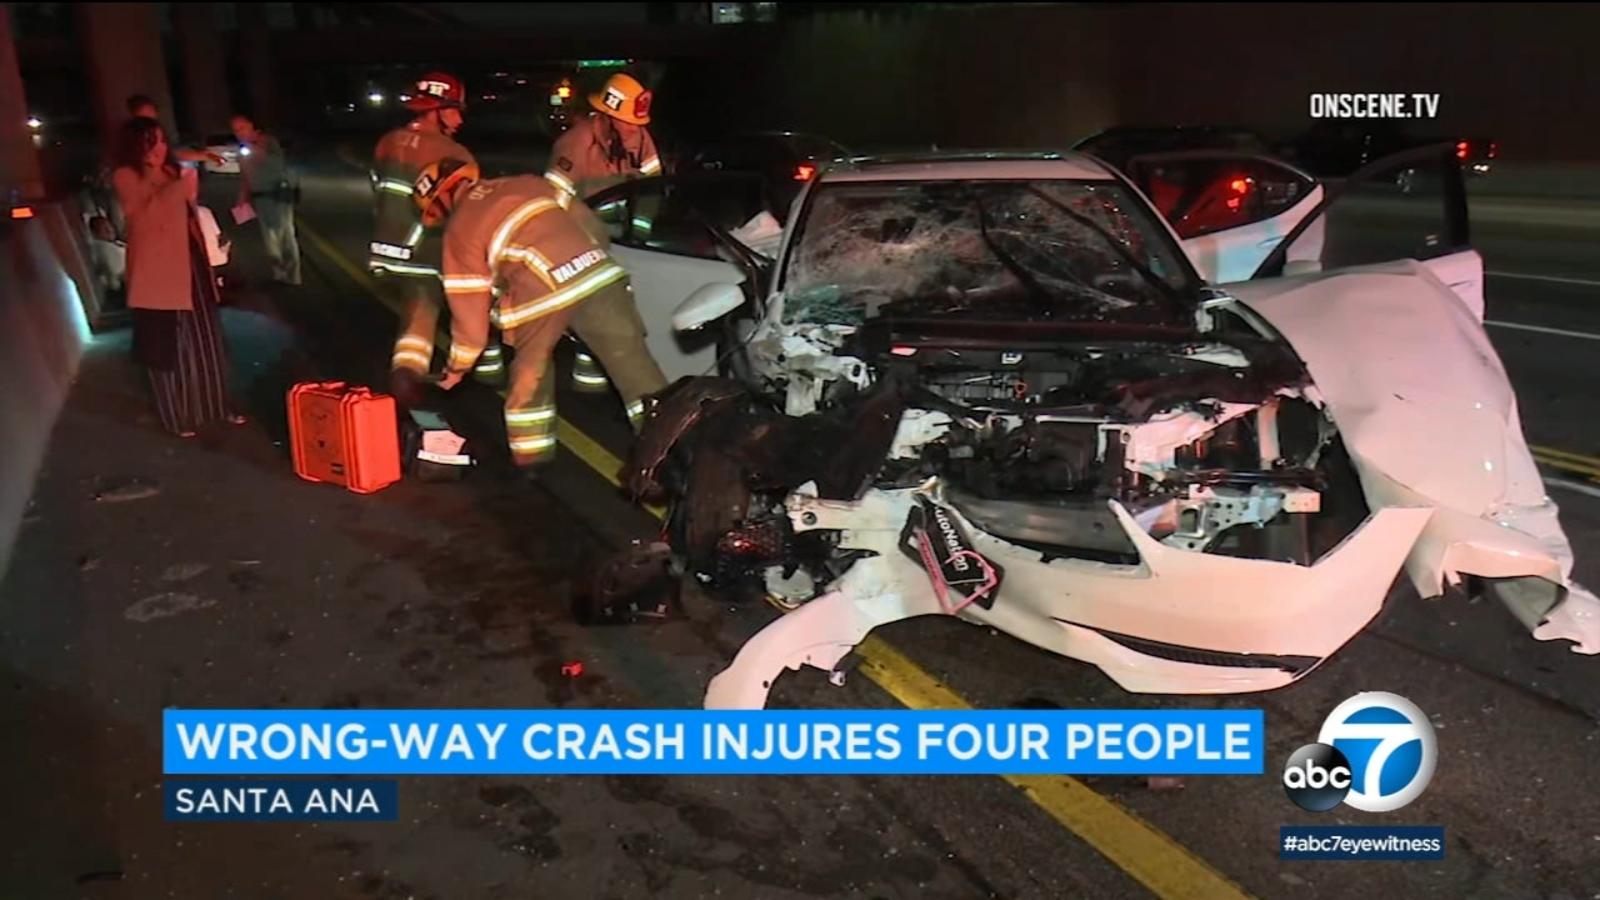 DUI suspect arrested after wrong-way crash leaves 4 injured in OC